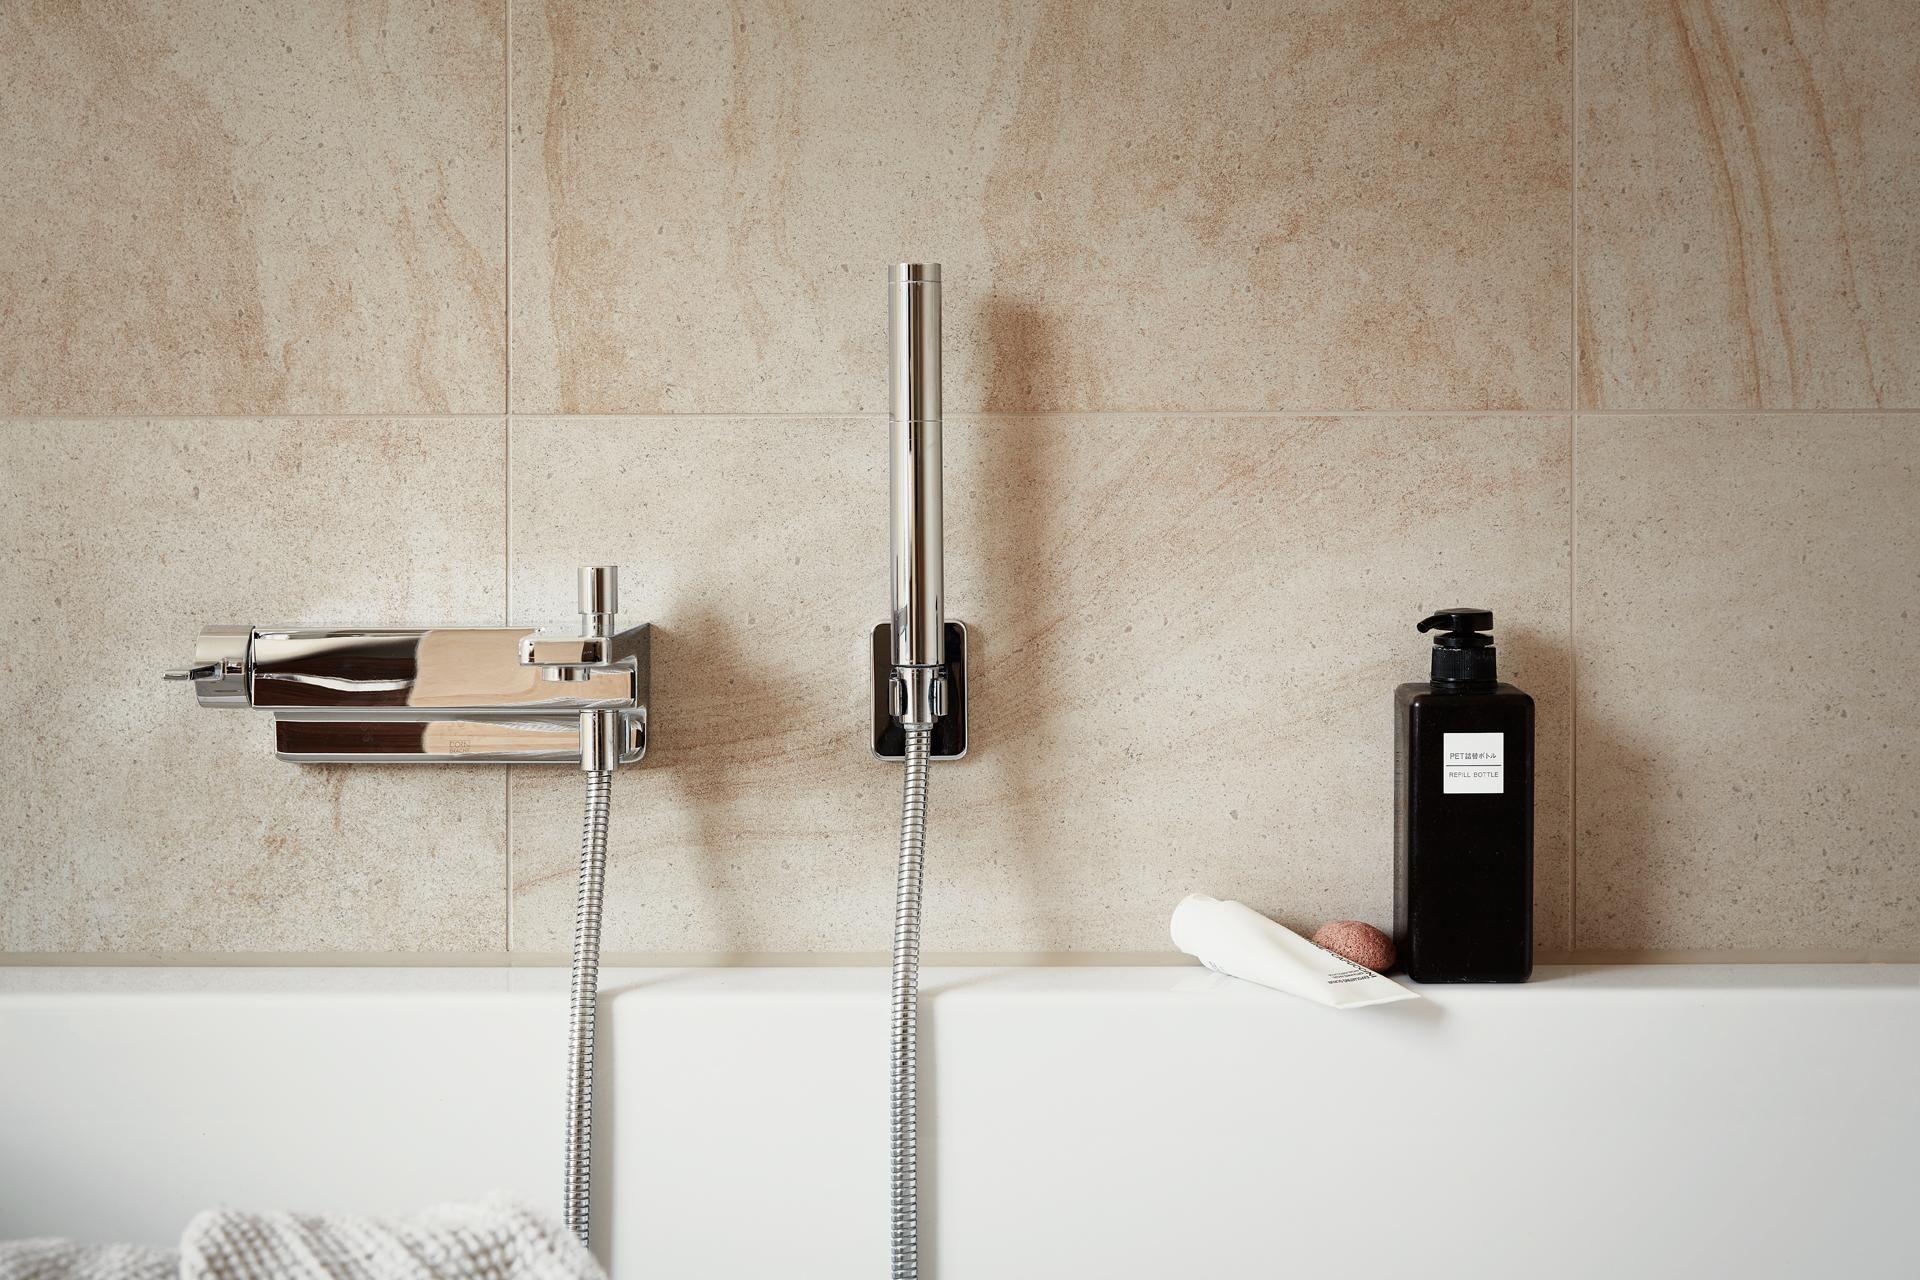 Bathtub Living Interior Berlin Deco Werftstrasse 2 Fantastic Frank Toilet Paper Holder Interior Bathtub